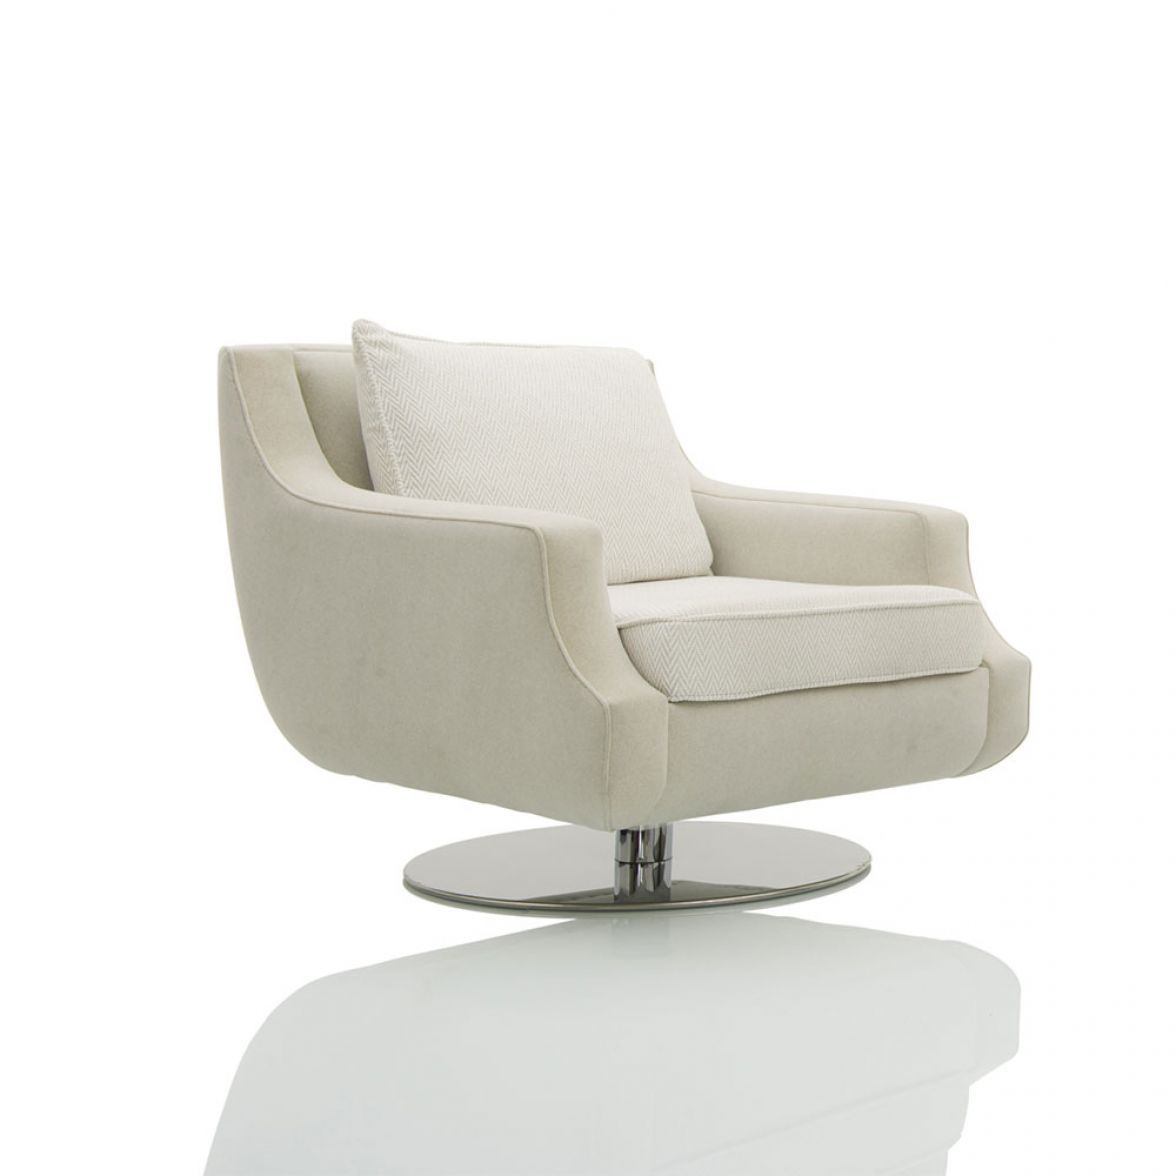 Trouville armchair фото цена